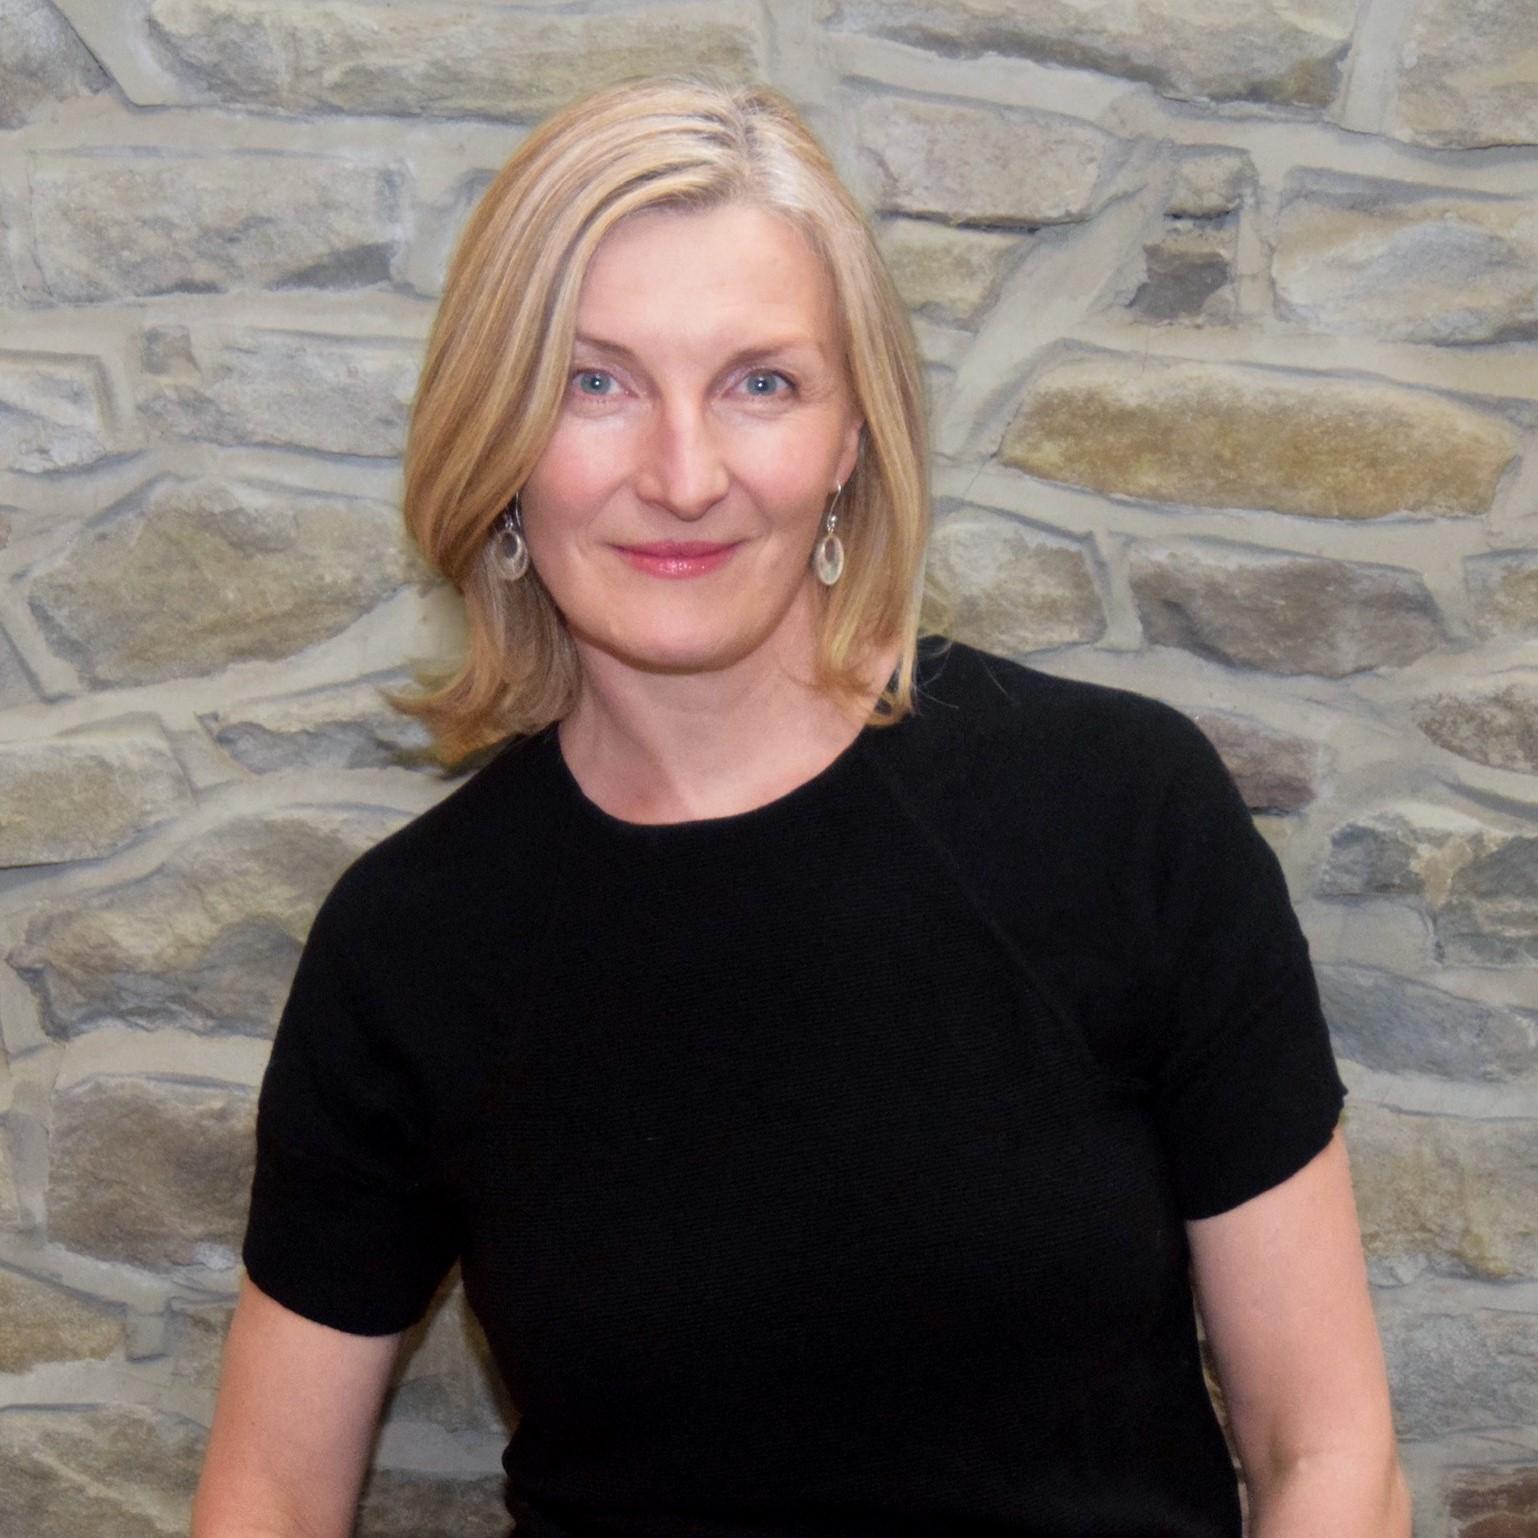 Dr. Pippa Grange